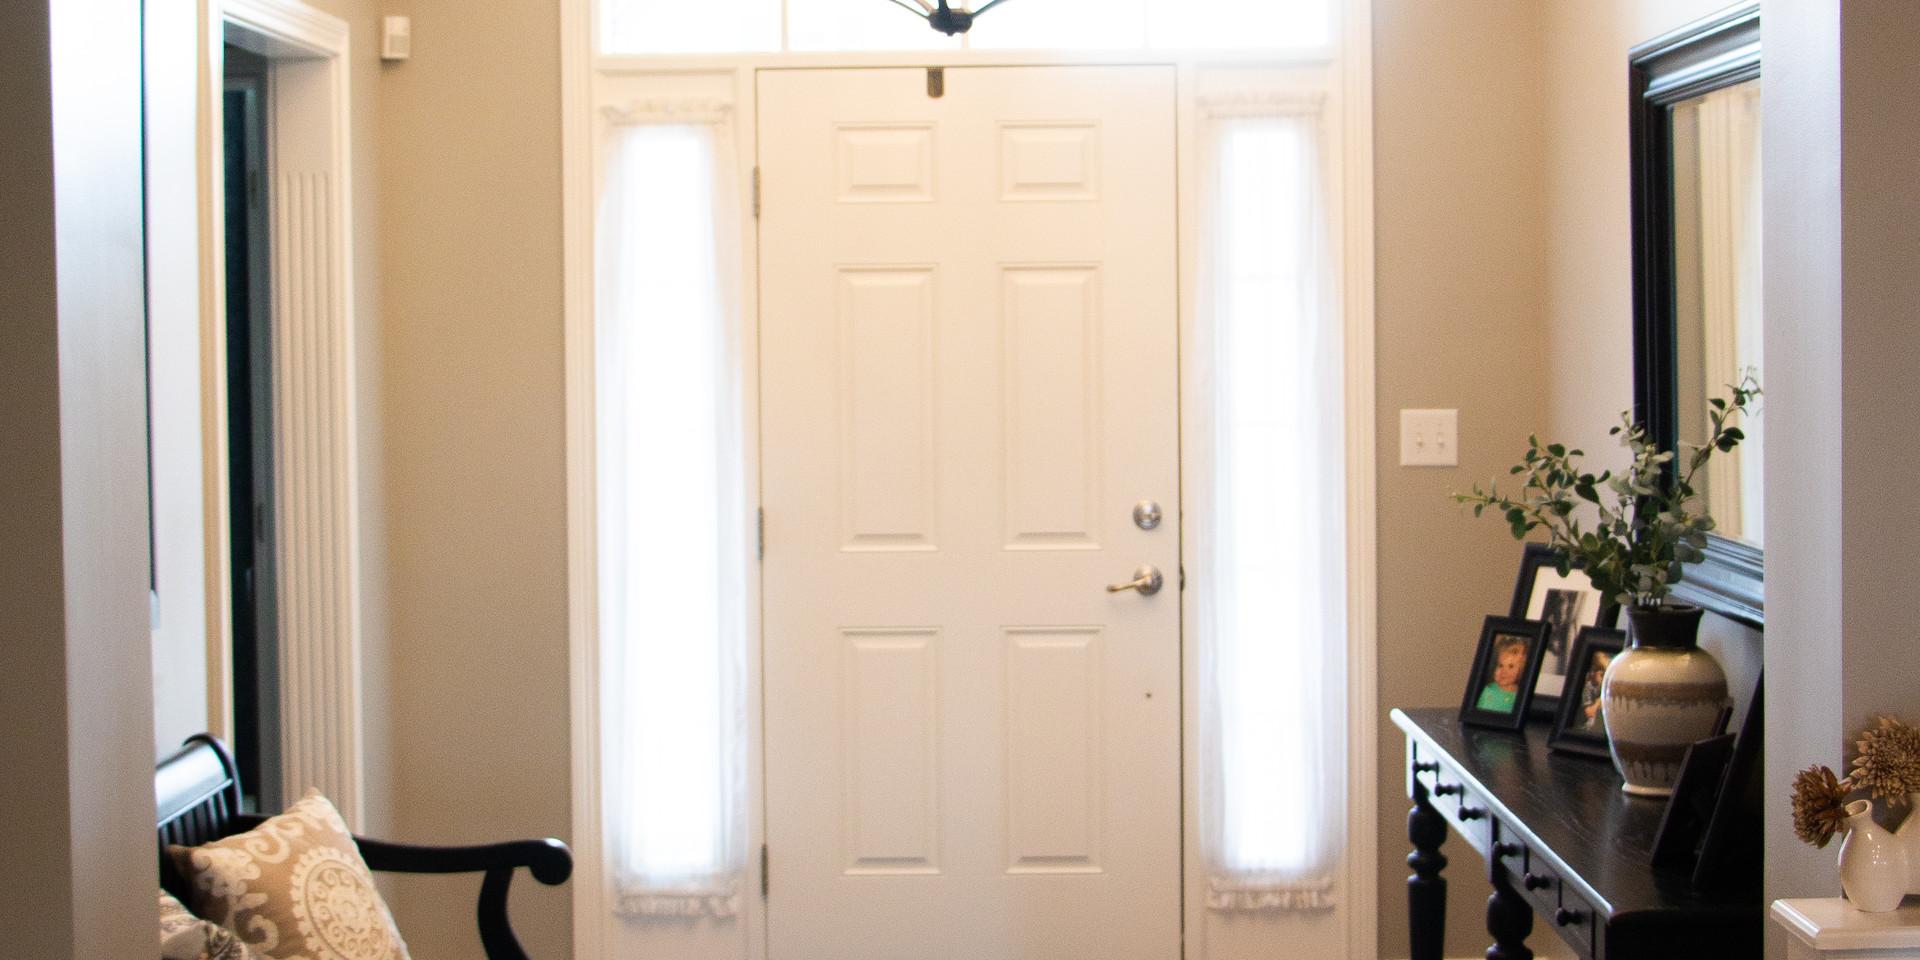 Home_Remodel_Entryway